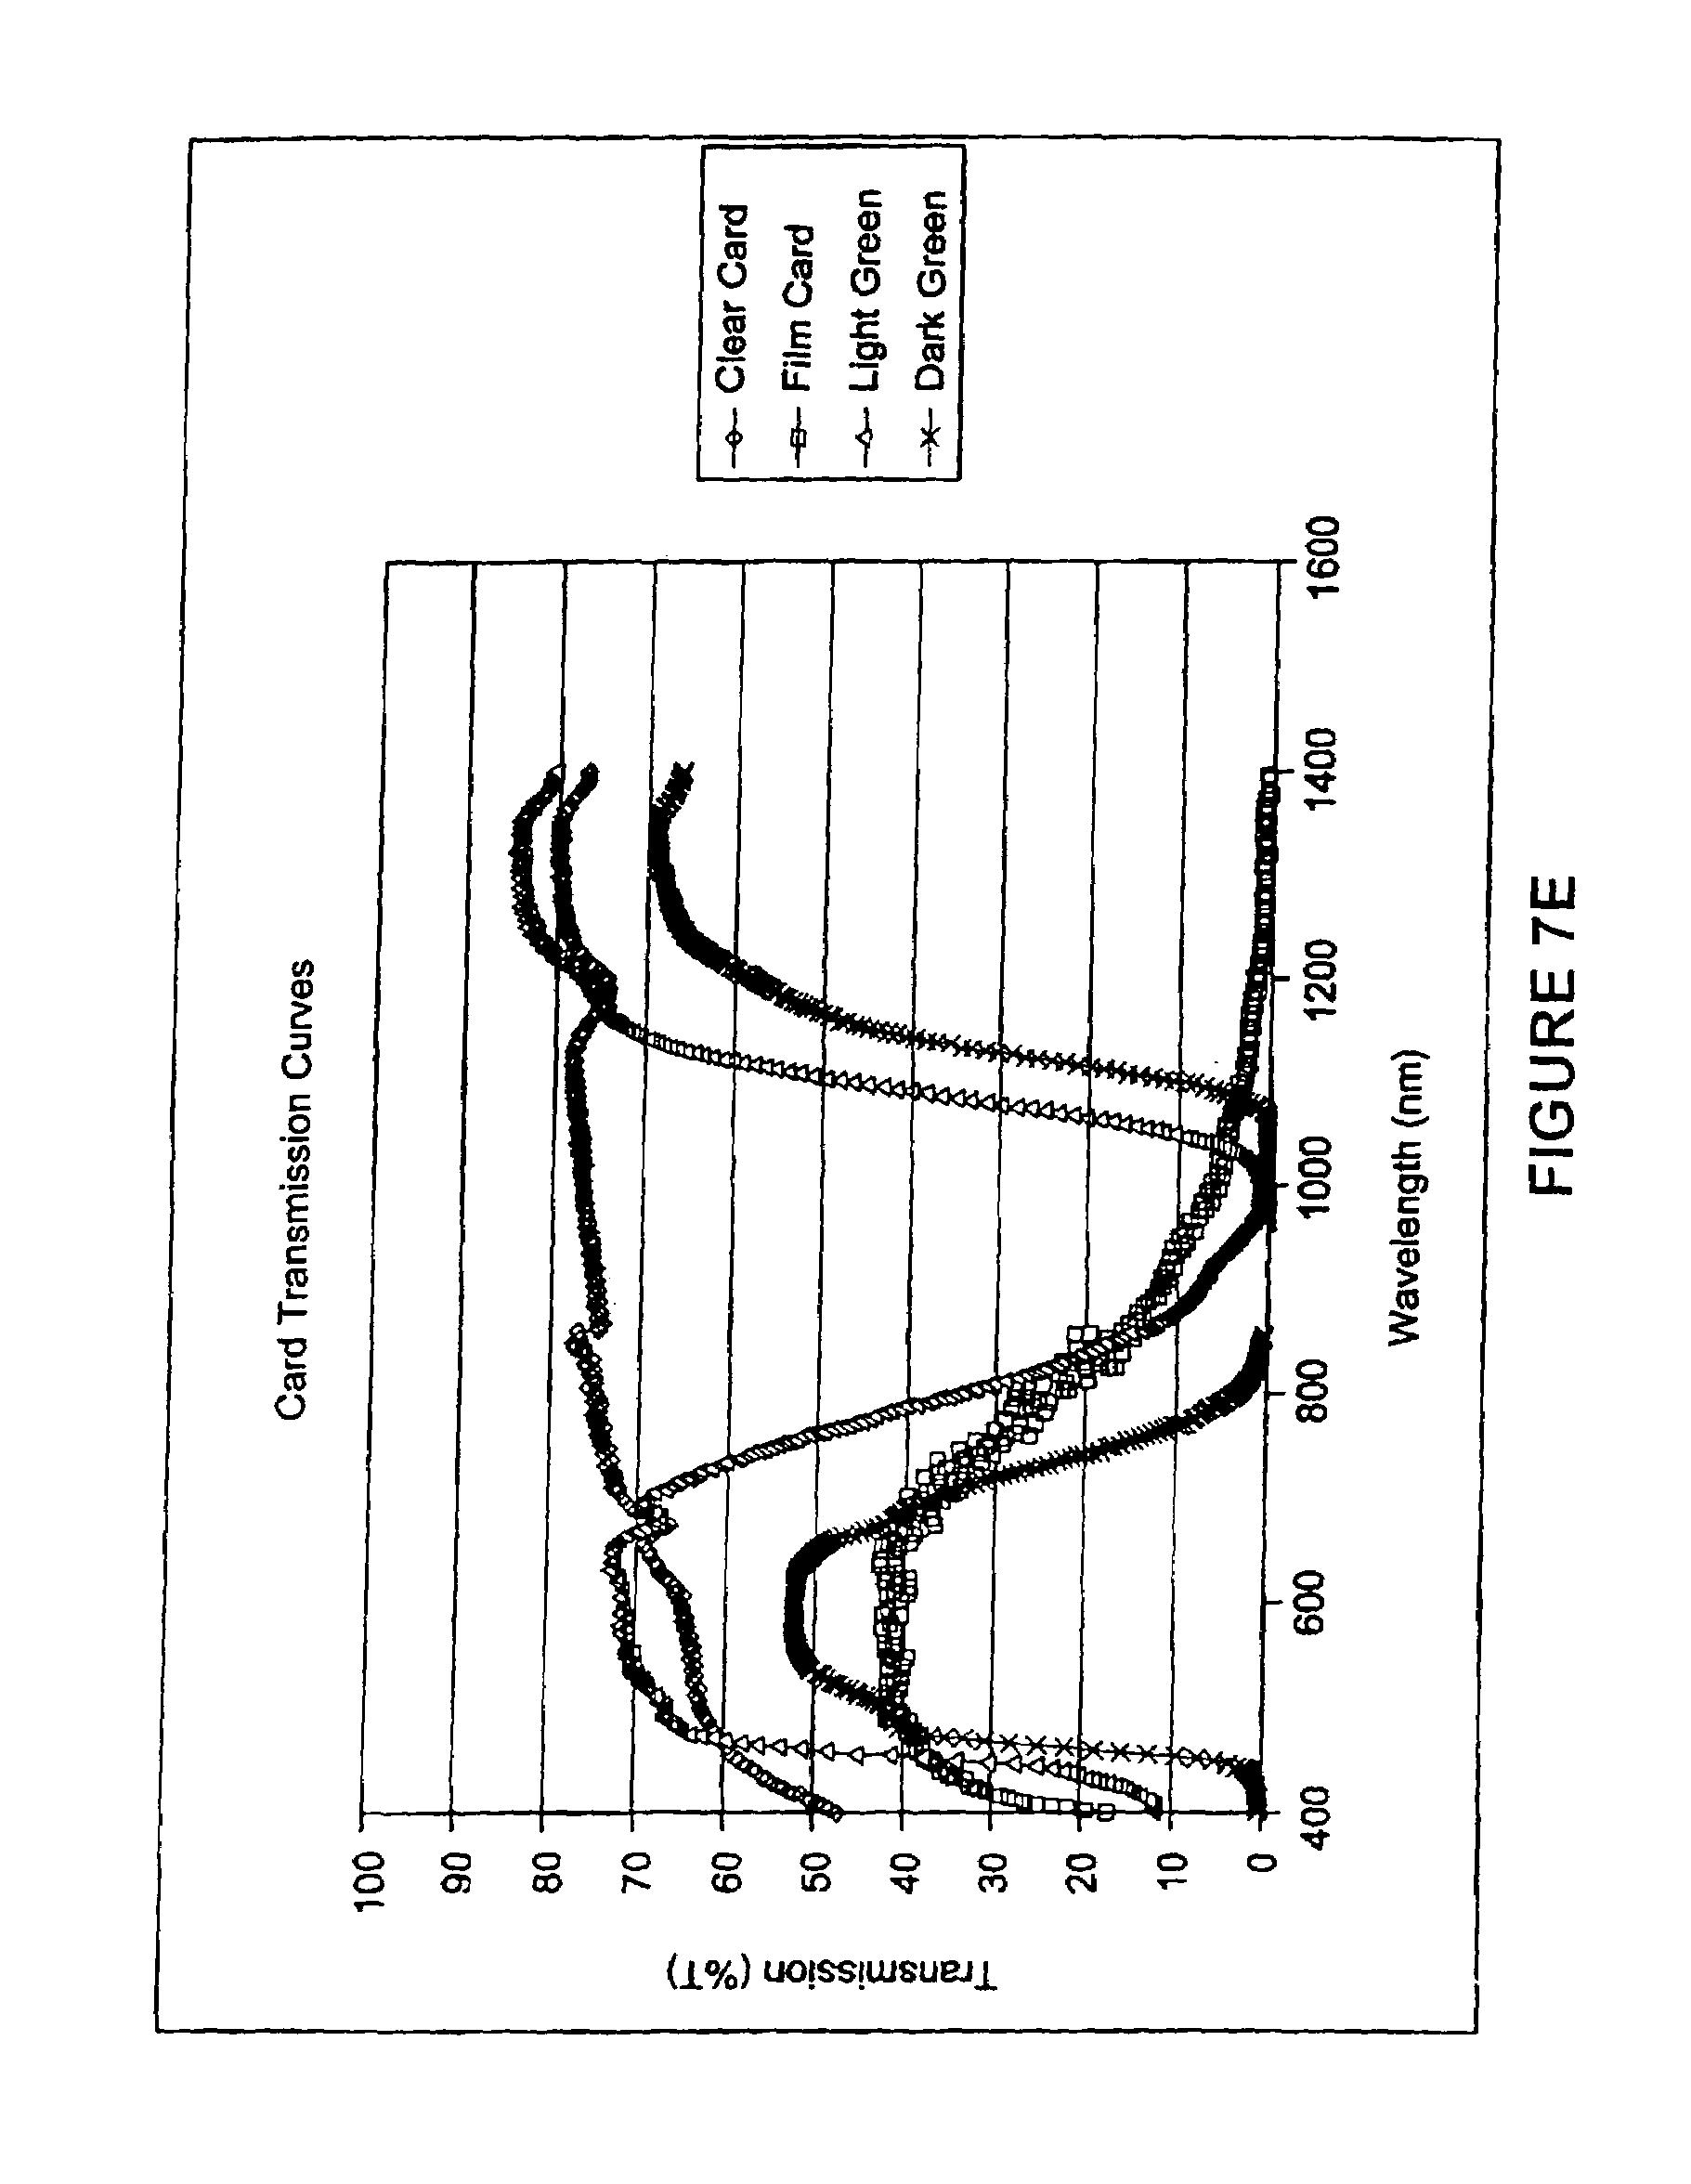 Patent US 7,306,158 B2